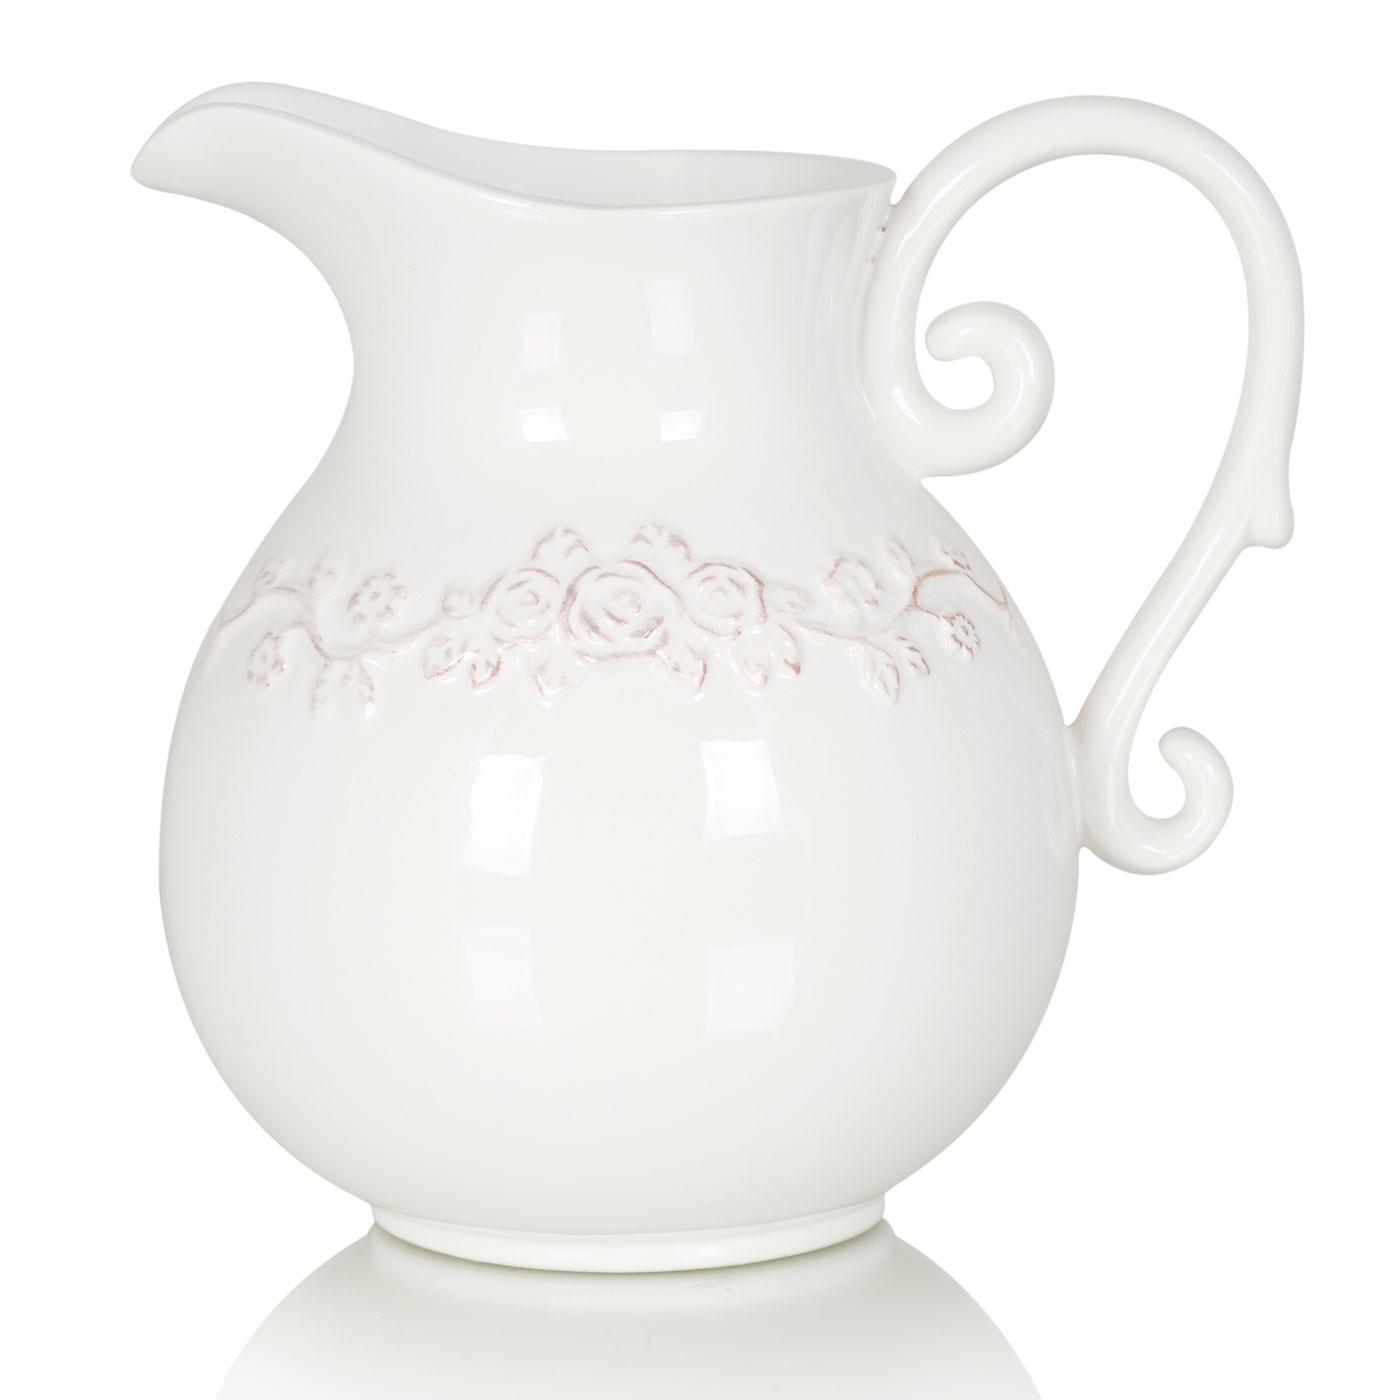 {} Home Philosophy Ваза-кувшин Bailey Цвет: Белый (13х18х18 см) home philosophy ваза mariana цвет молочный набор